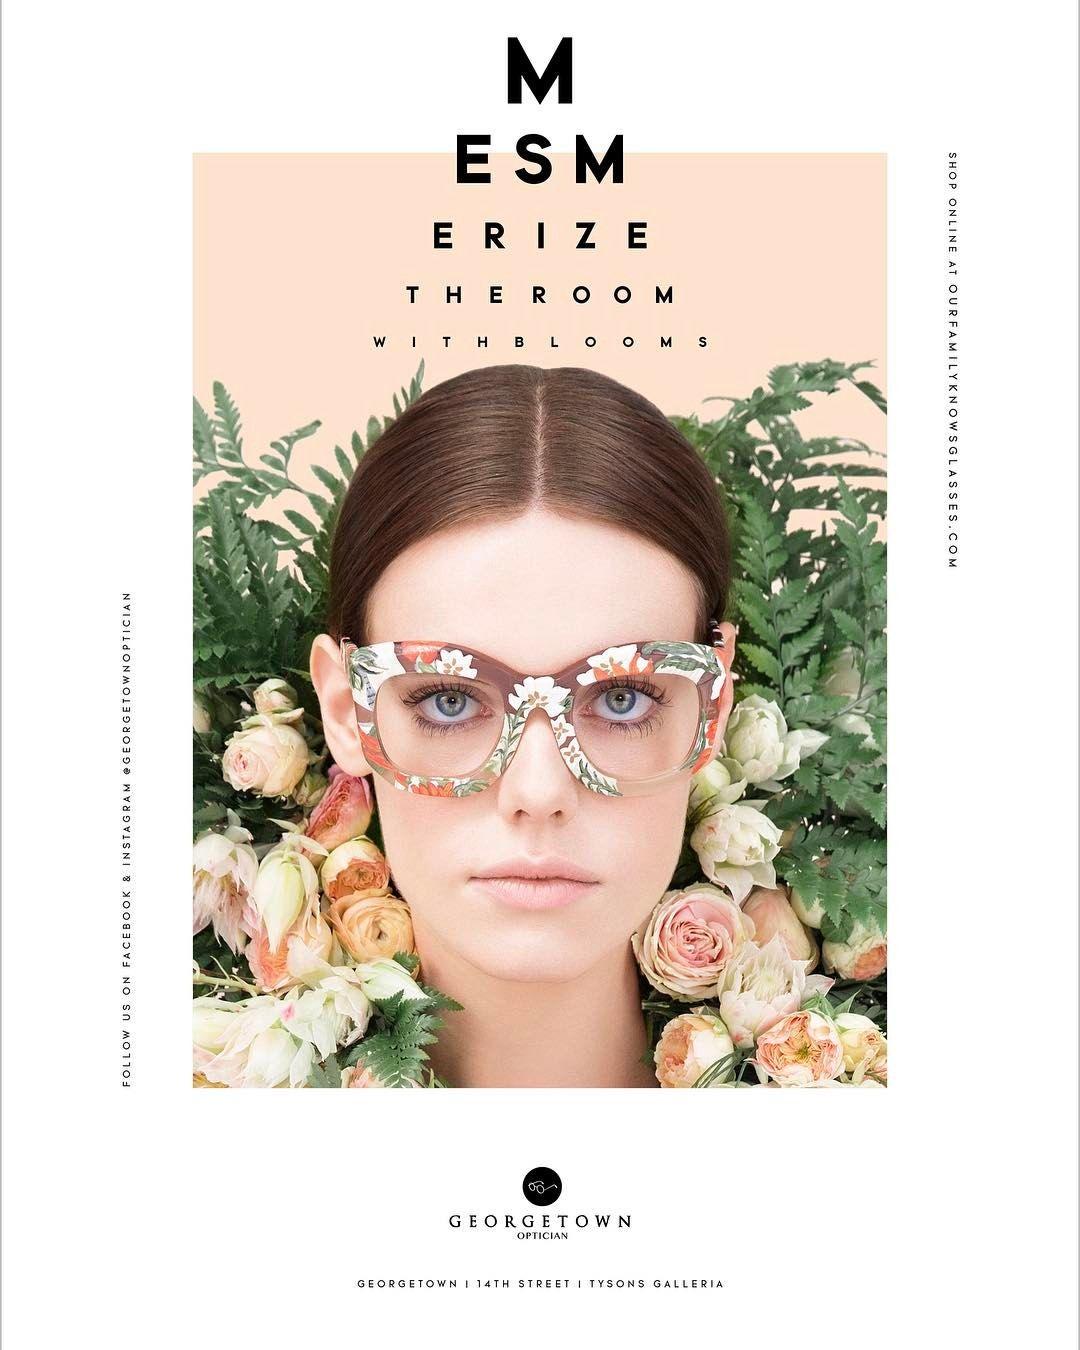 aa1e922b6a Spring has definitely sprung! New Georgetown Optician ad!   georgetownoptician Creative Directio